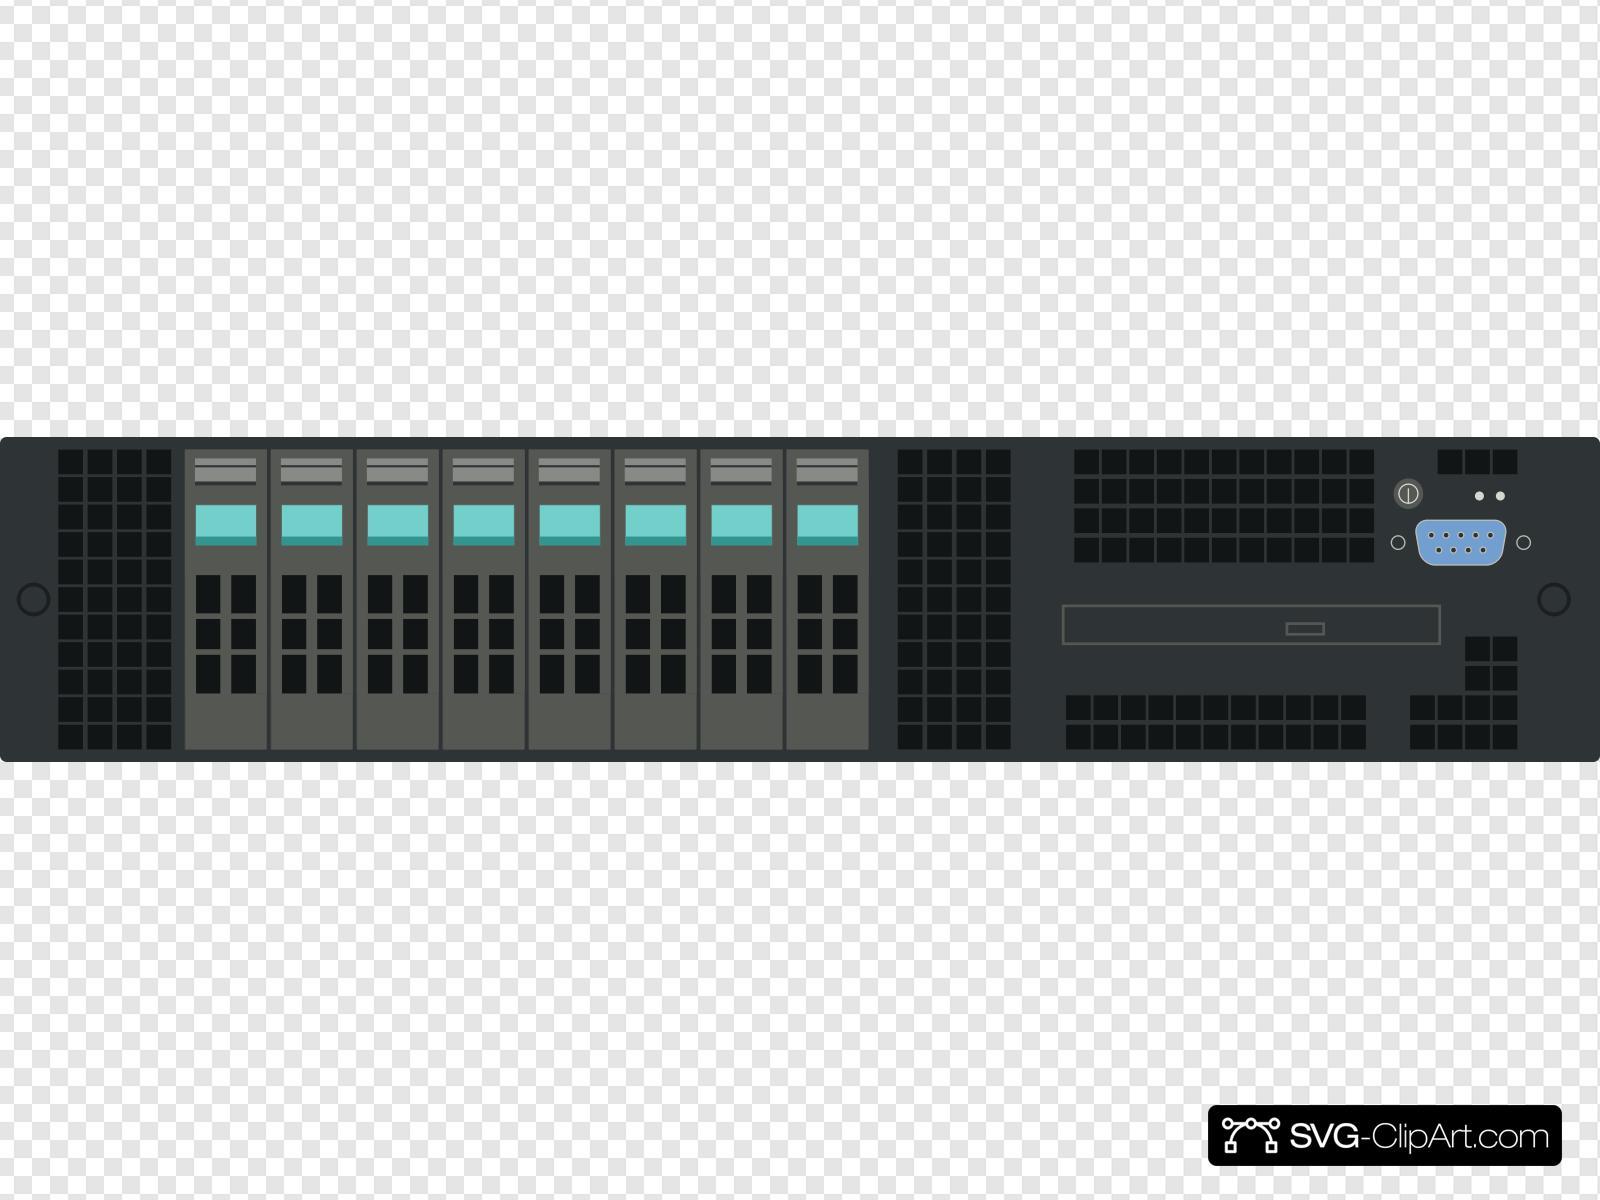 Rack server clipart vector black and white 2u Rack Server Clip art, Icon and SVG - SVG Clipart vector black and white